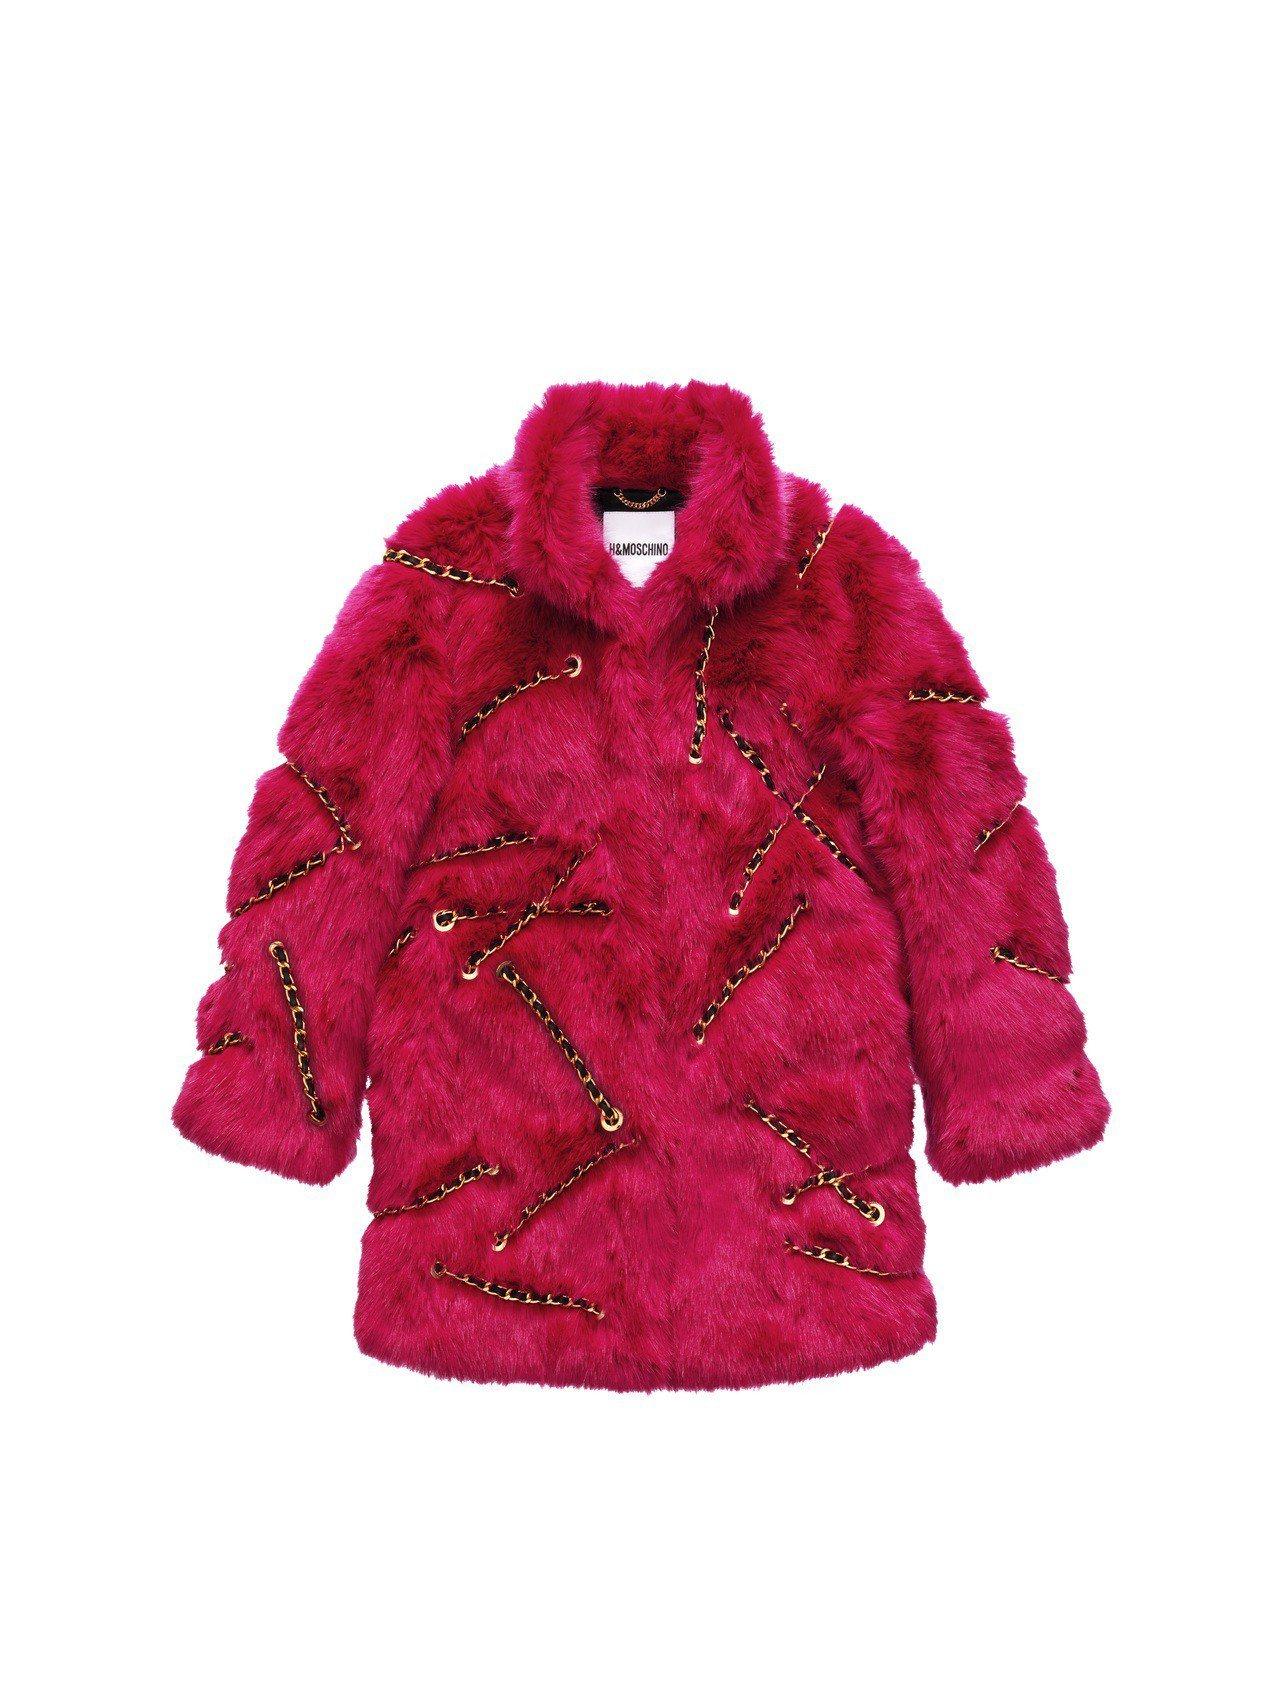 Moschino[TV] H&M系列女裝外套,7,999元。圖/H&M提供